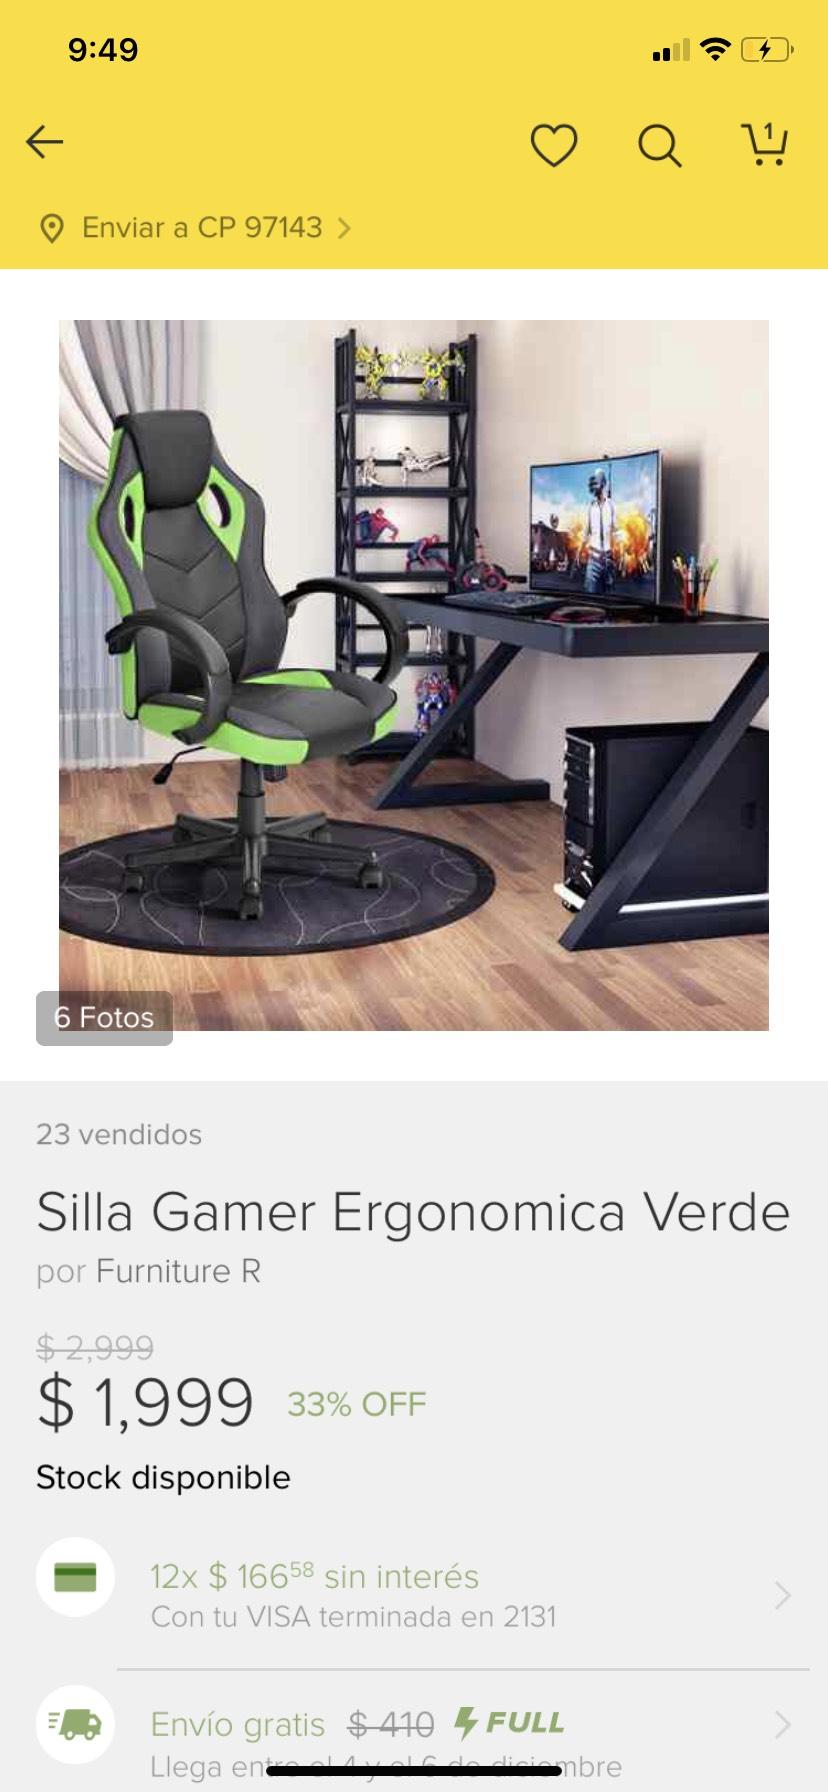 Tienda oficial Furniture R en Mercado Libre: Silla gamer ergonómica verde